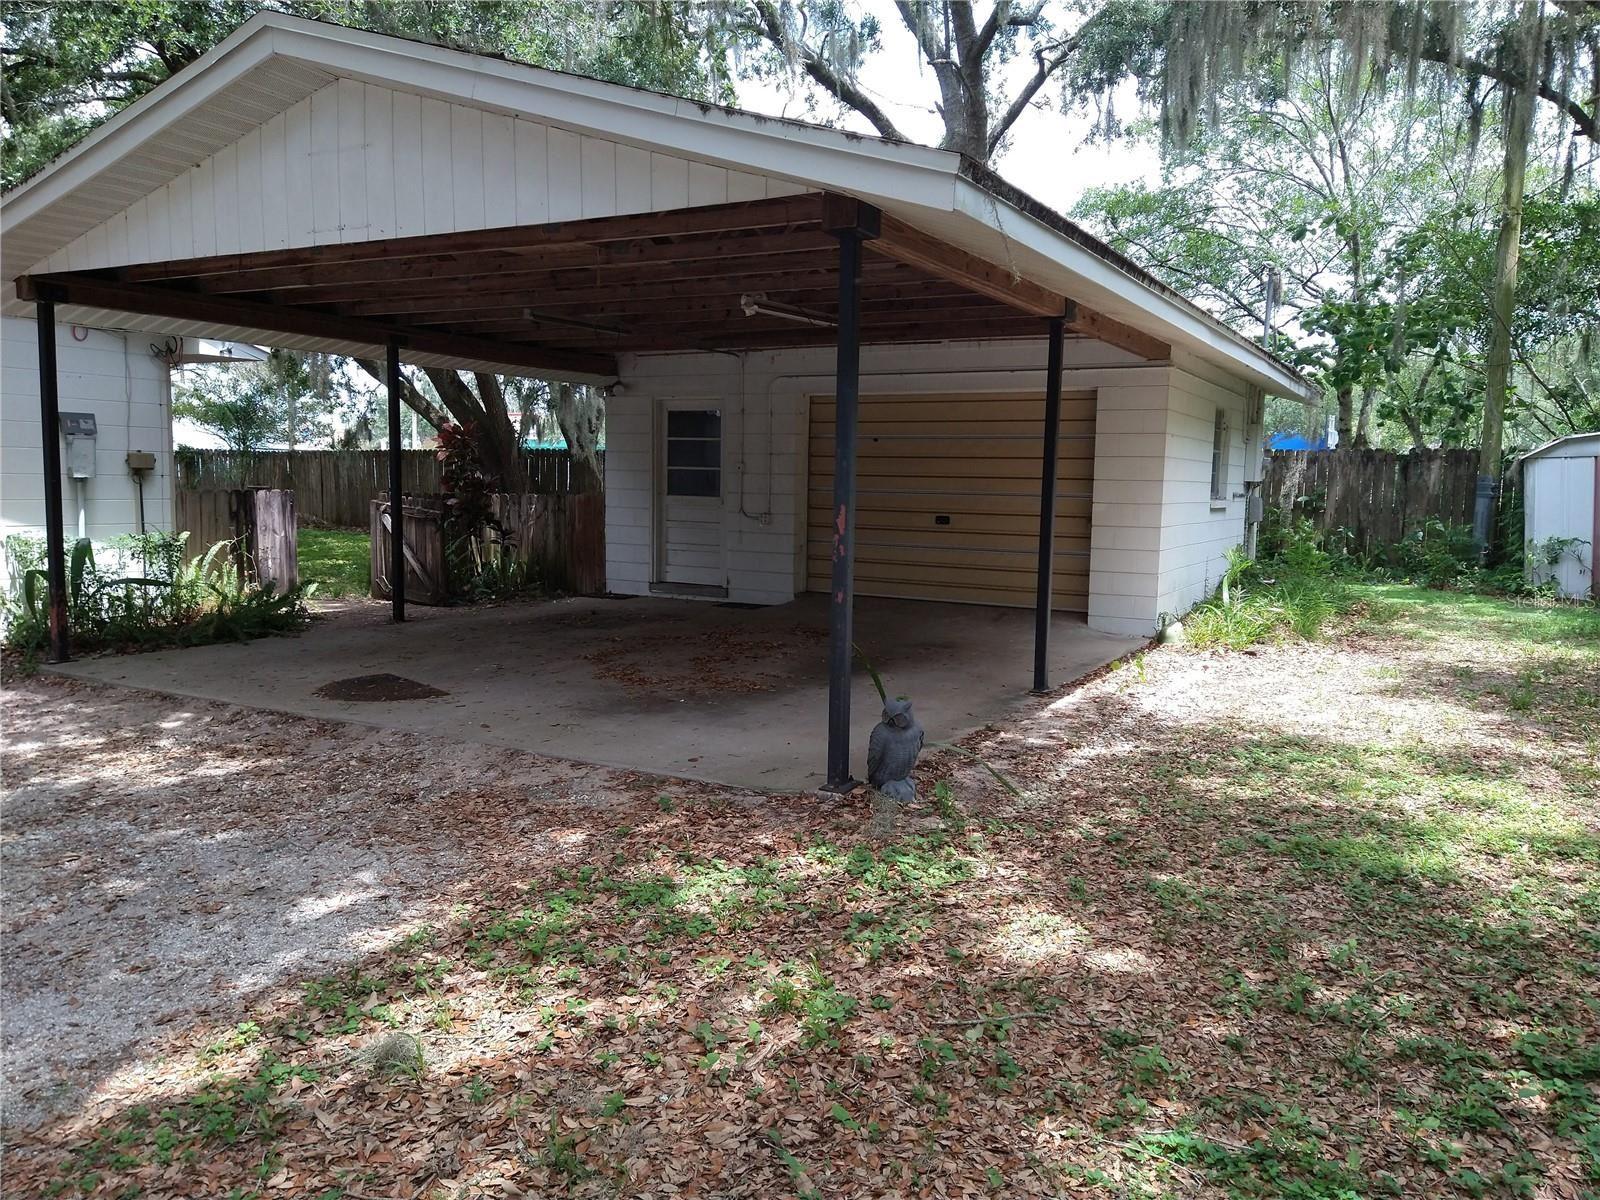 Photo of 11208 THOMAS STREET, SEFFNER, FL 33584 (MLS # T3314306)